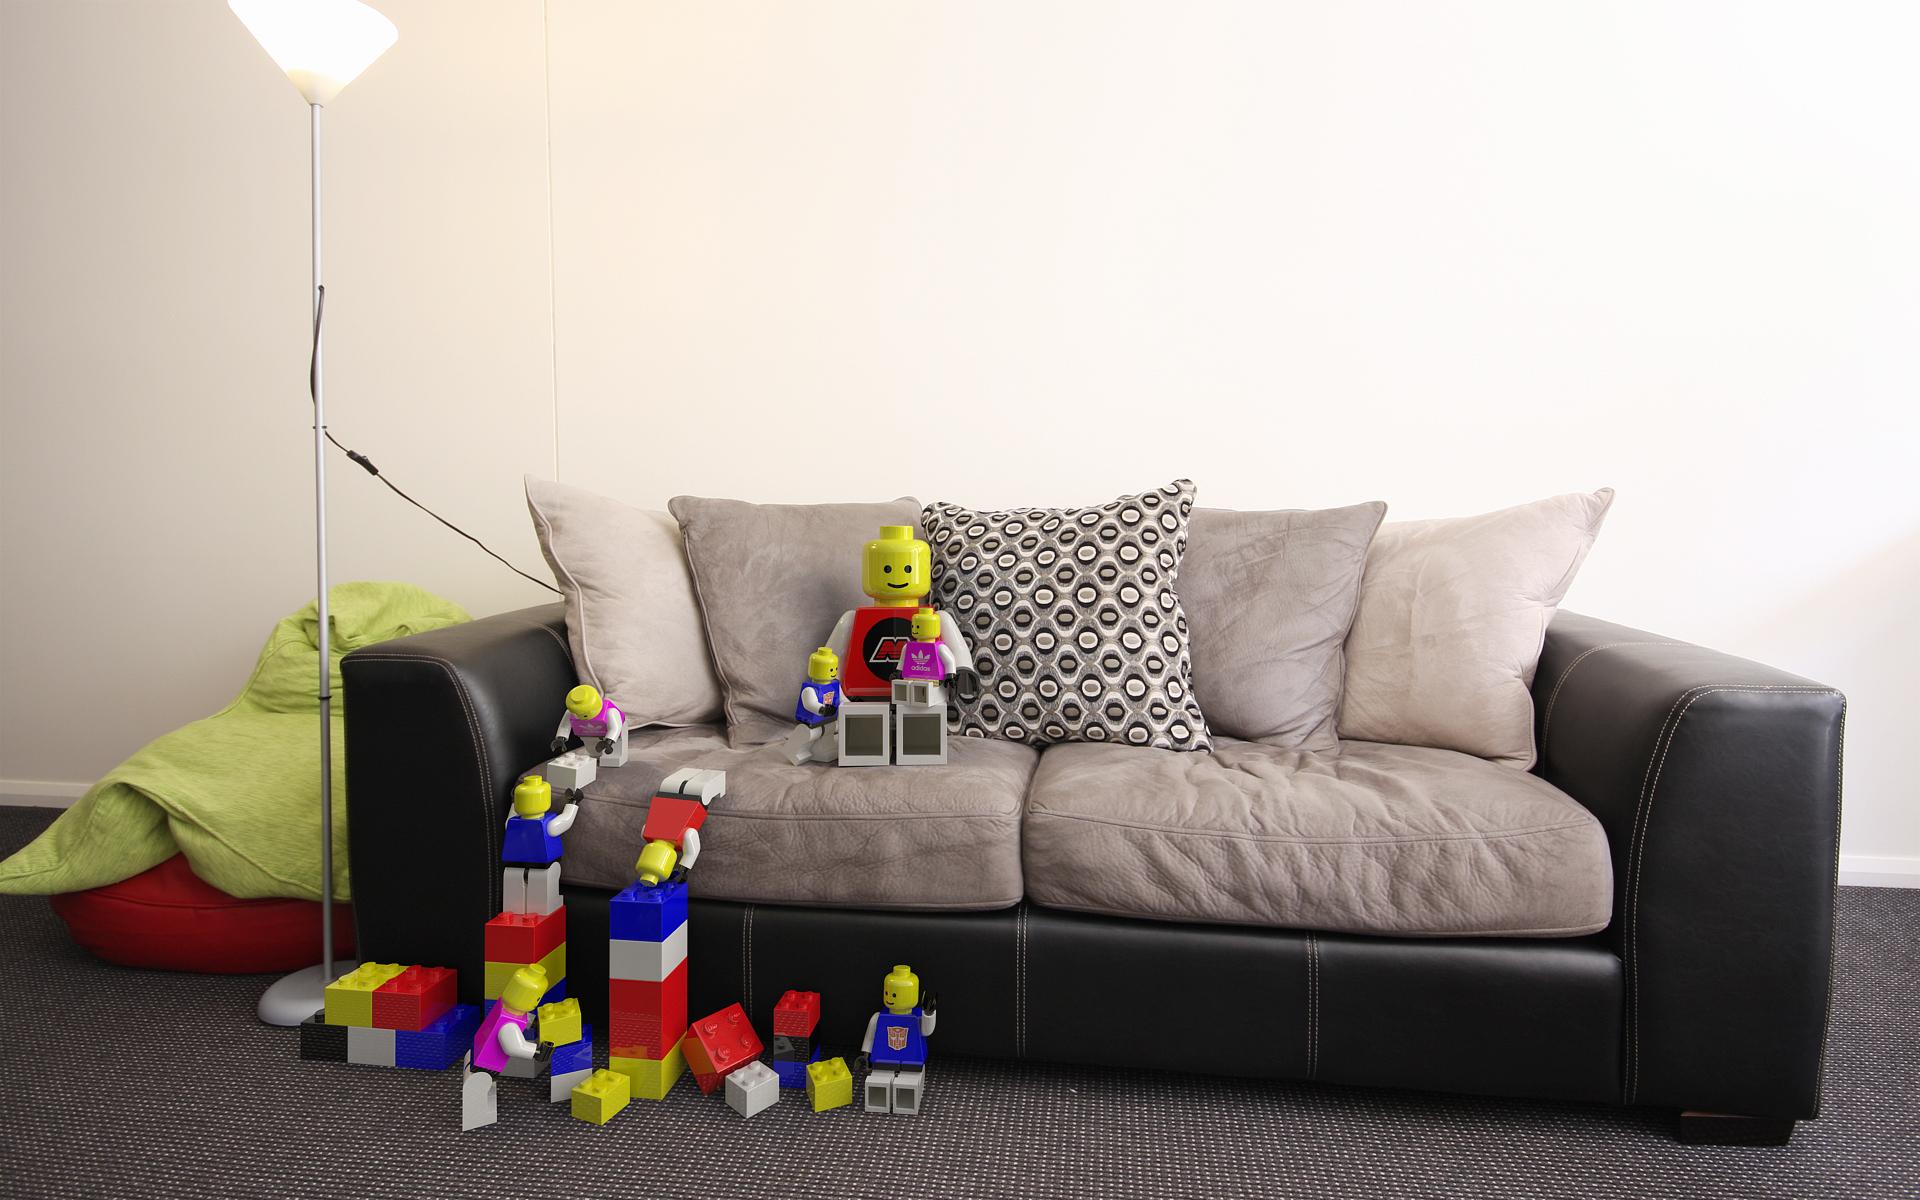 LEGO men by subaqua